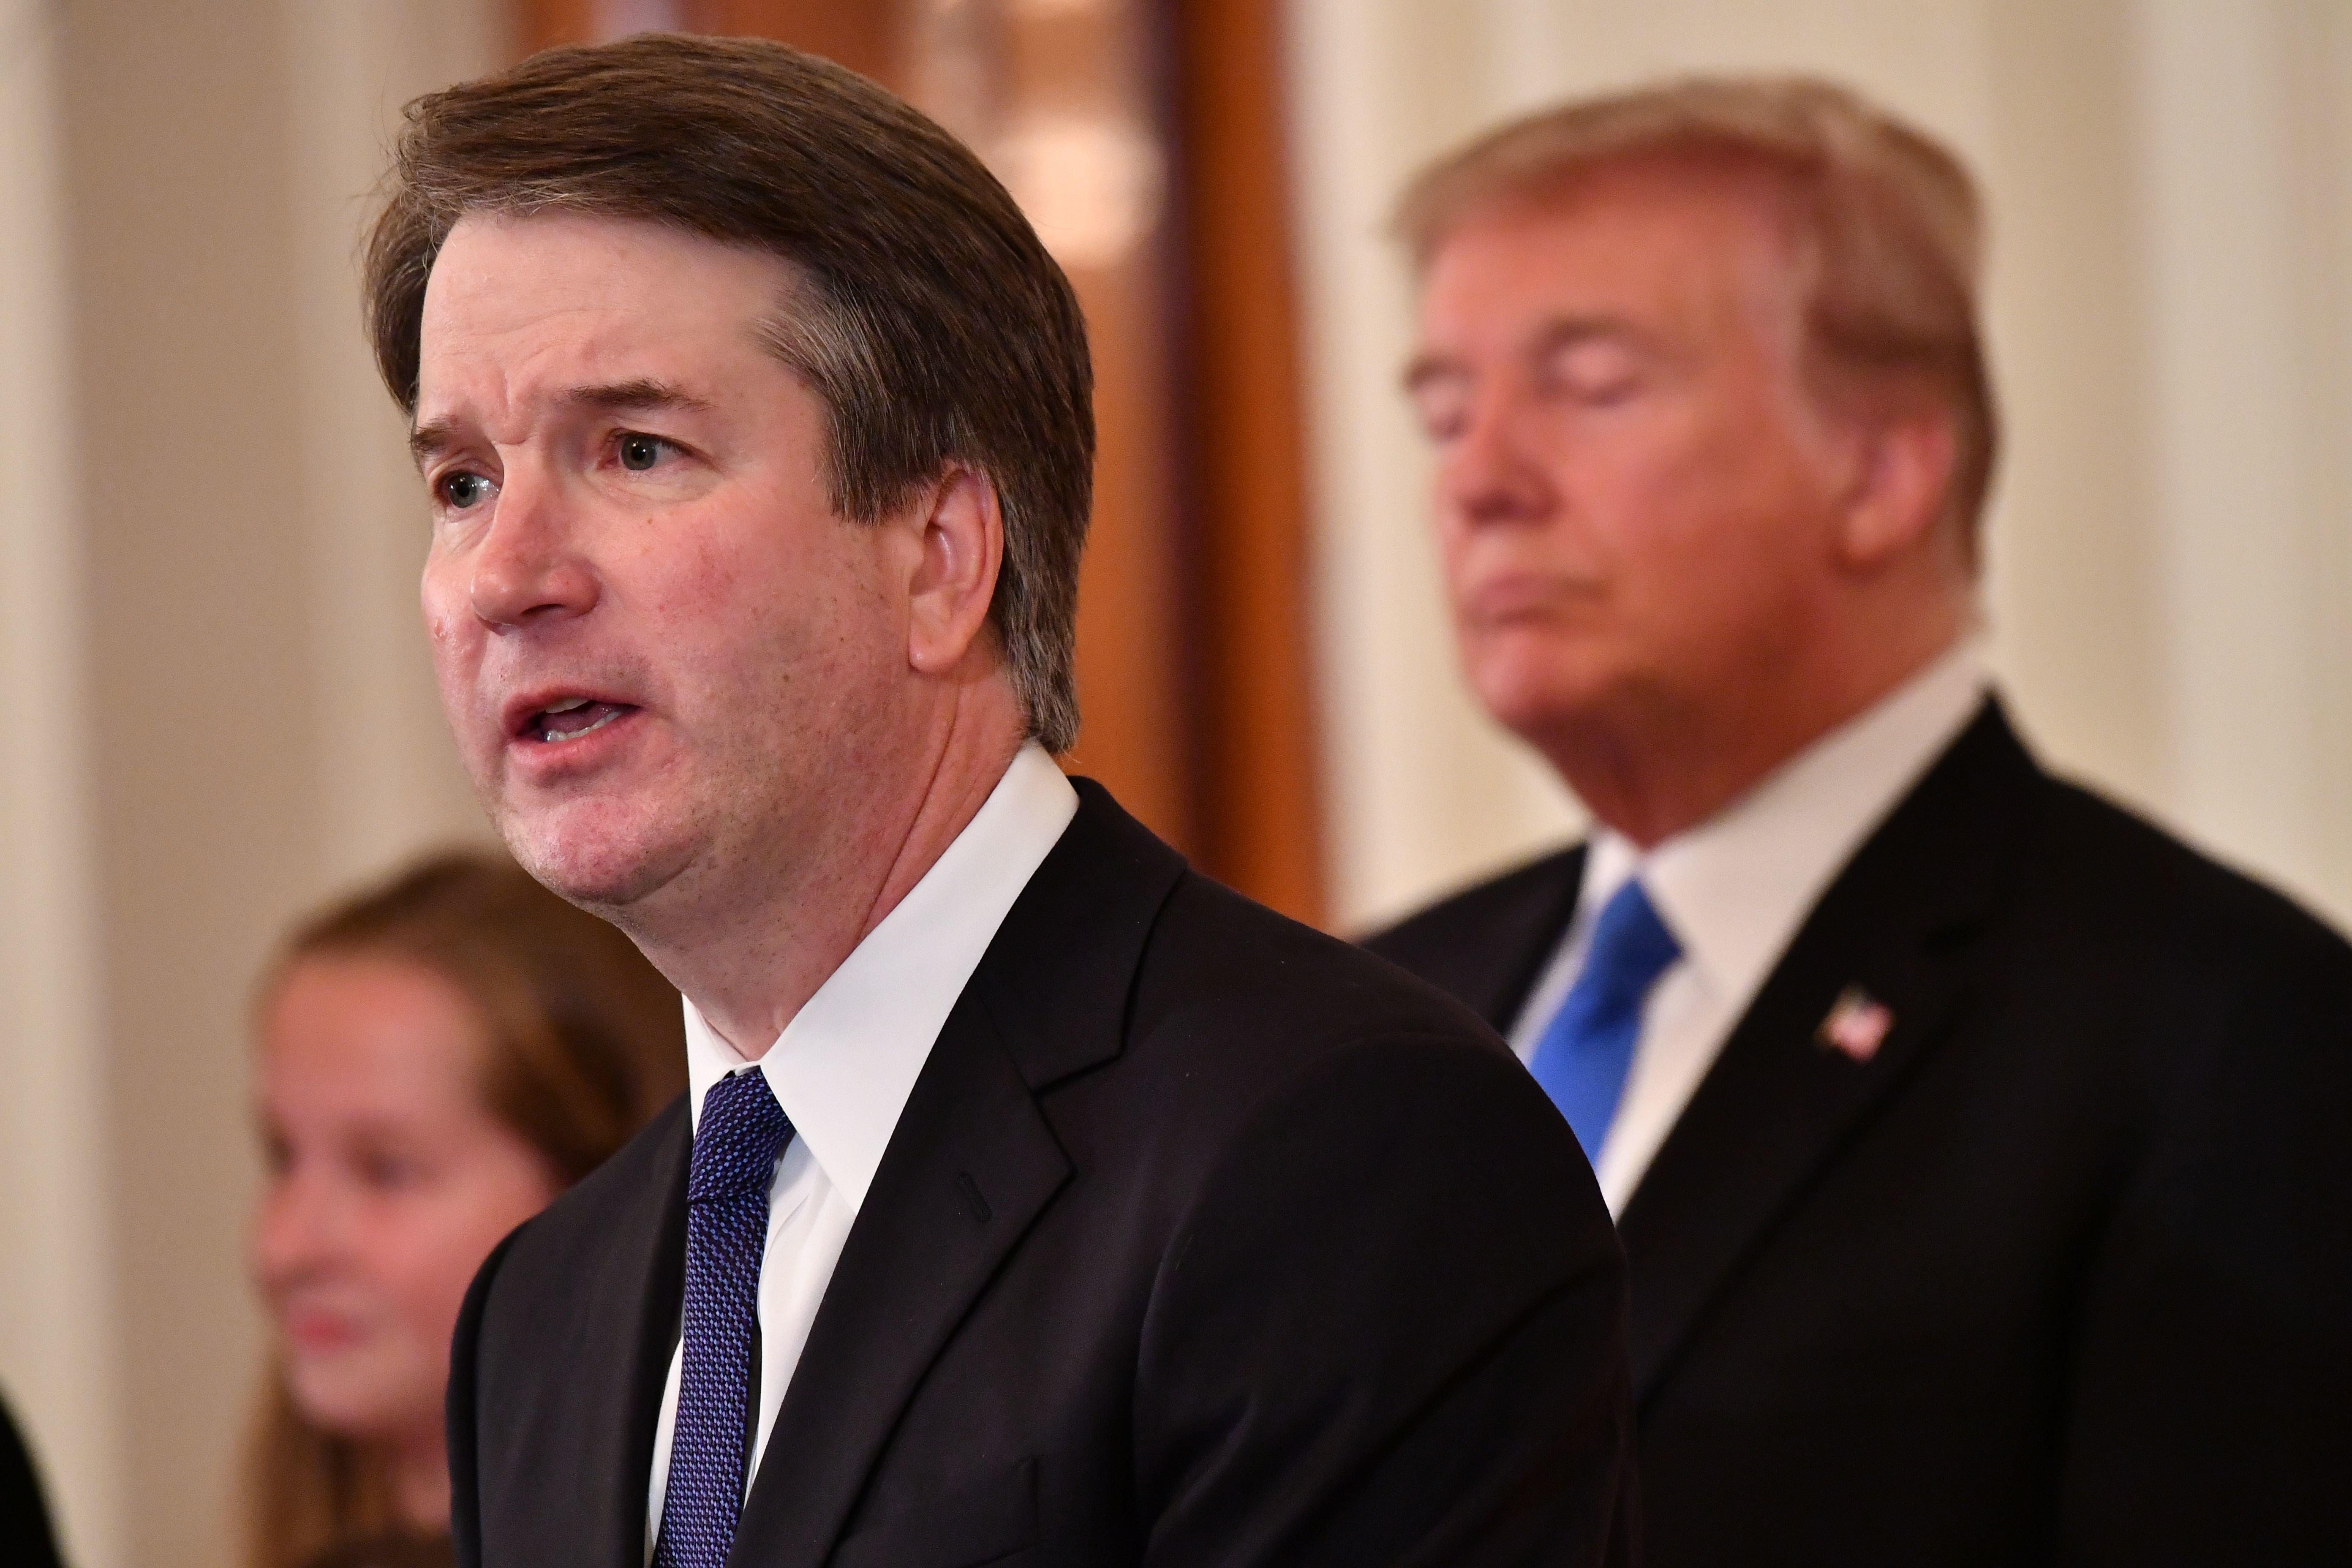 The GOP must suspend Brett Kavanaugh's Supreme Court nomination immediately.